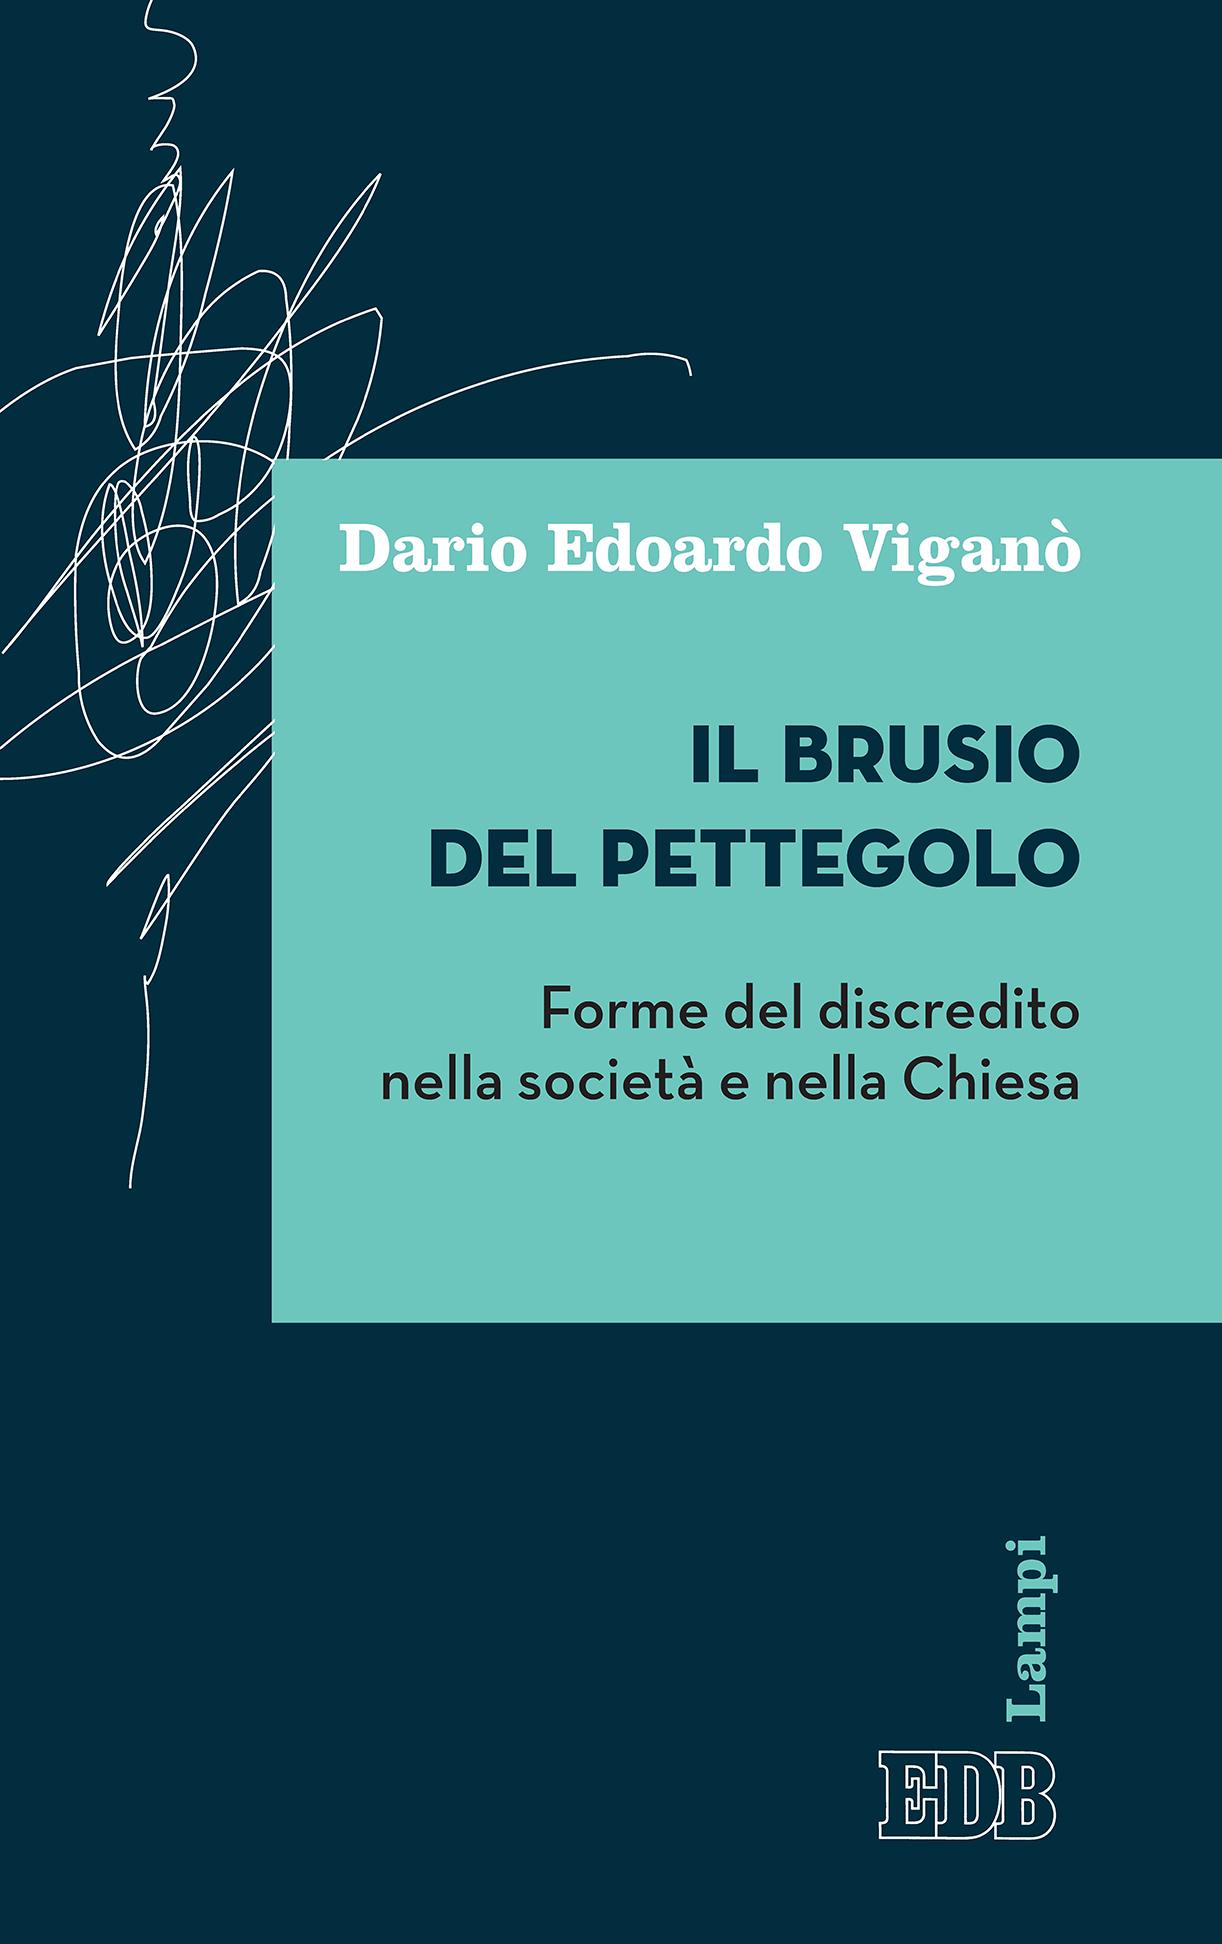 P9_Vigano_Il brusio_DEF2